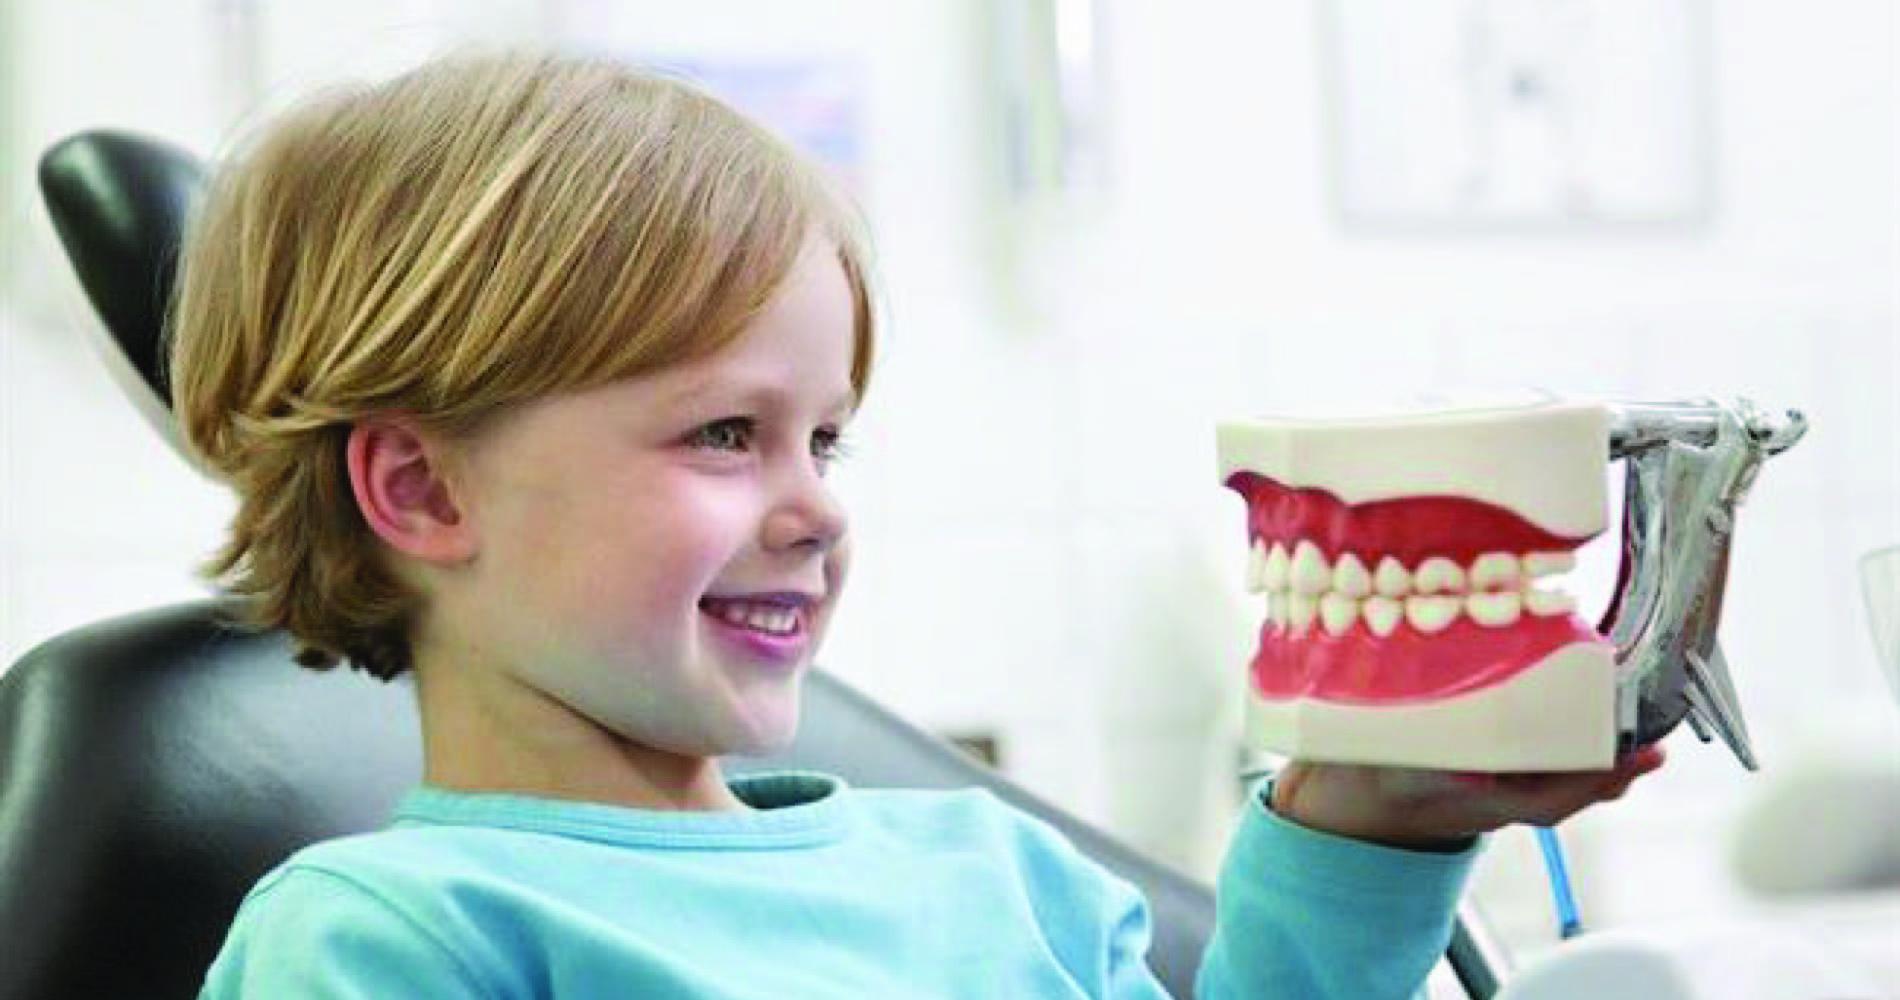 Paura del dentista